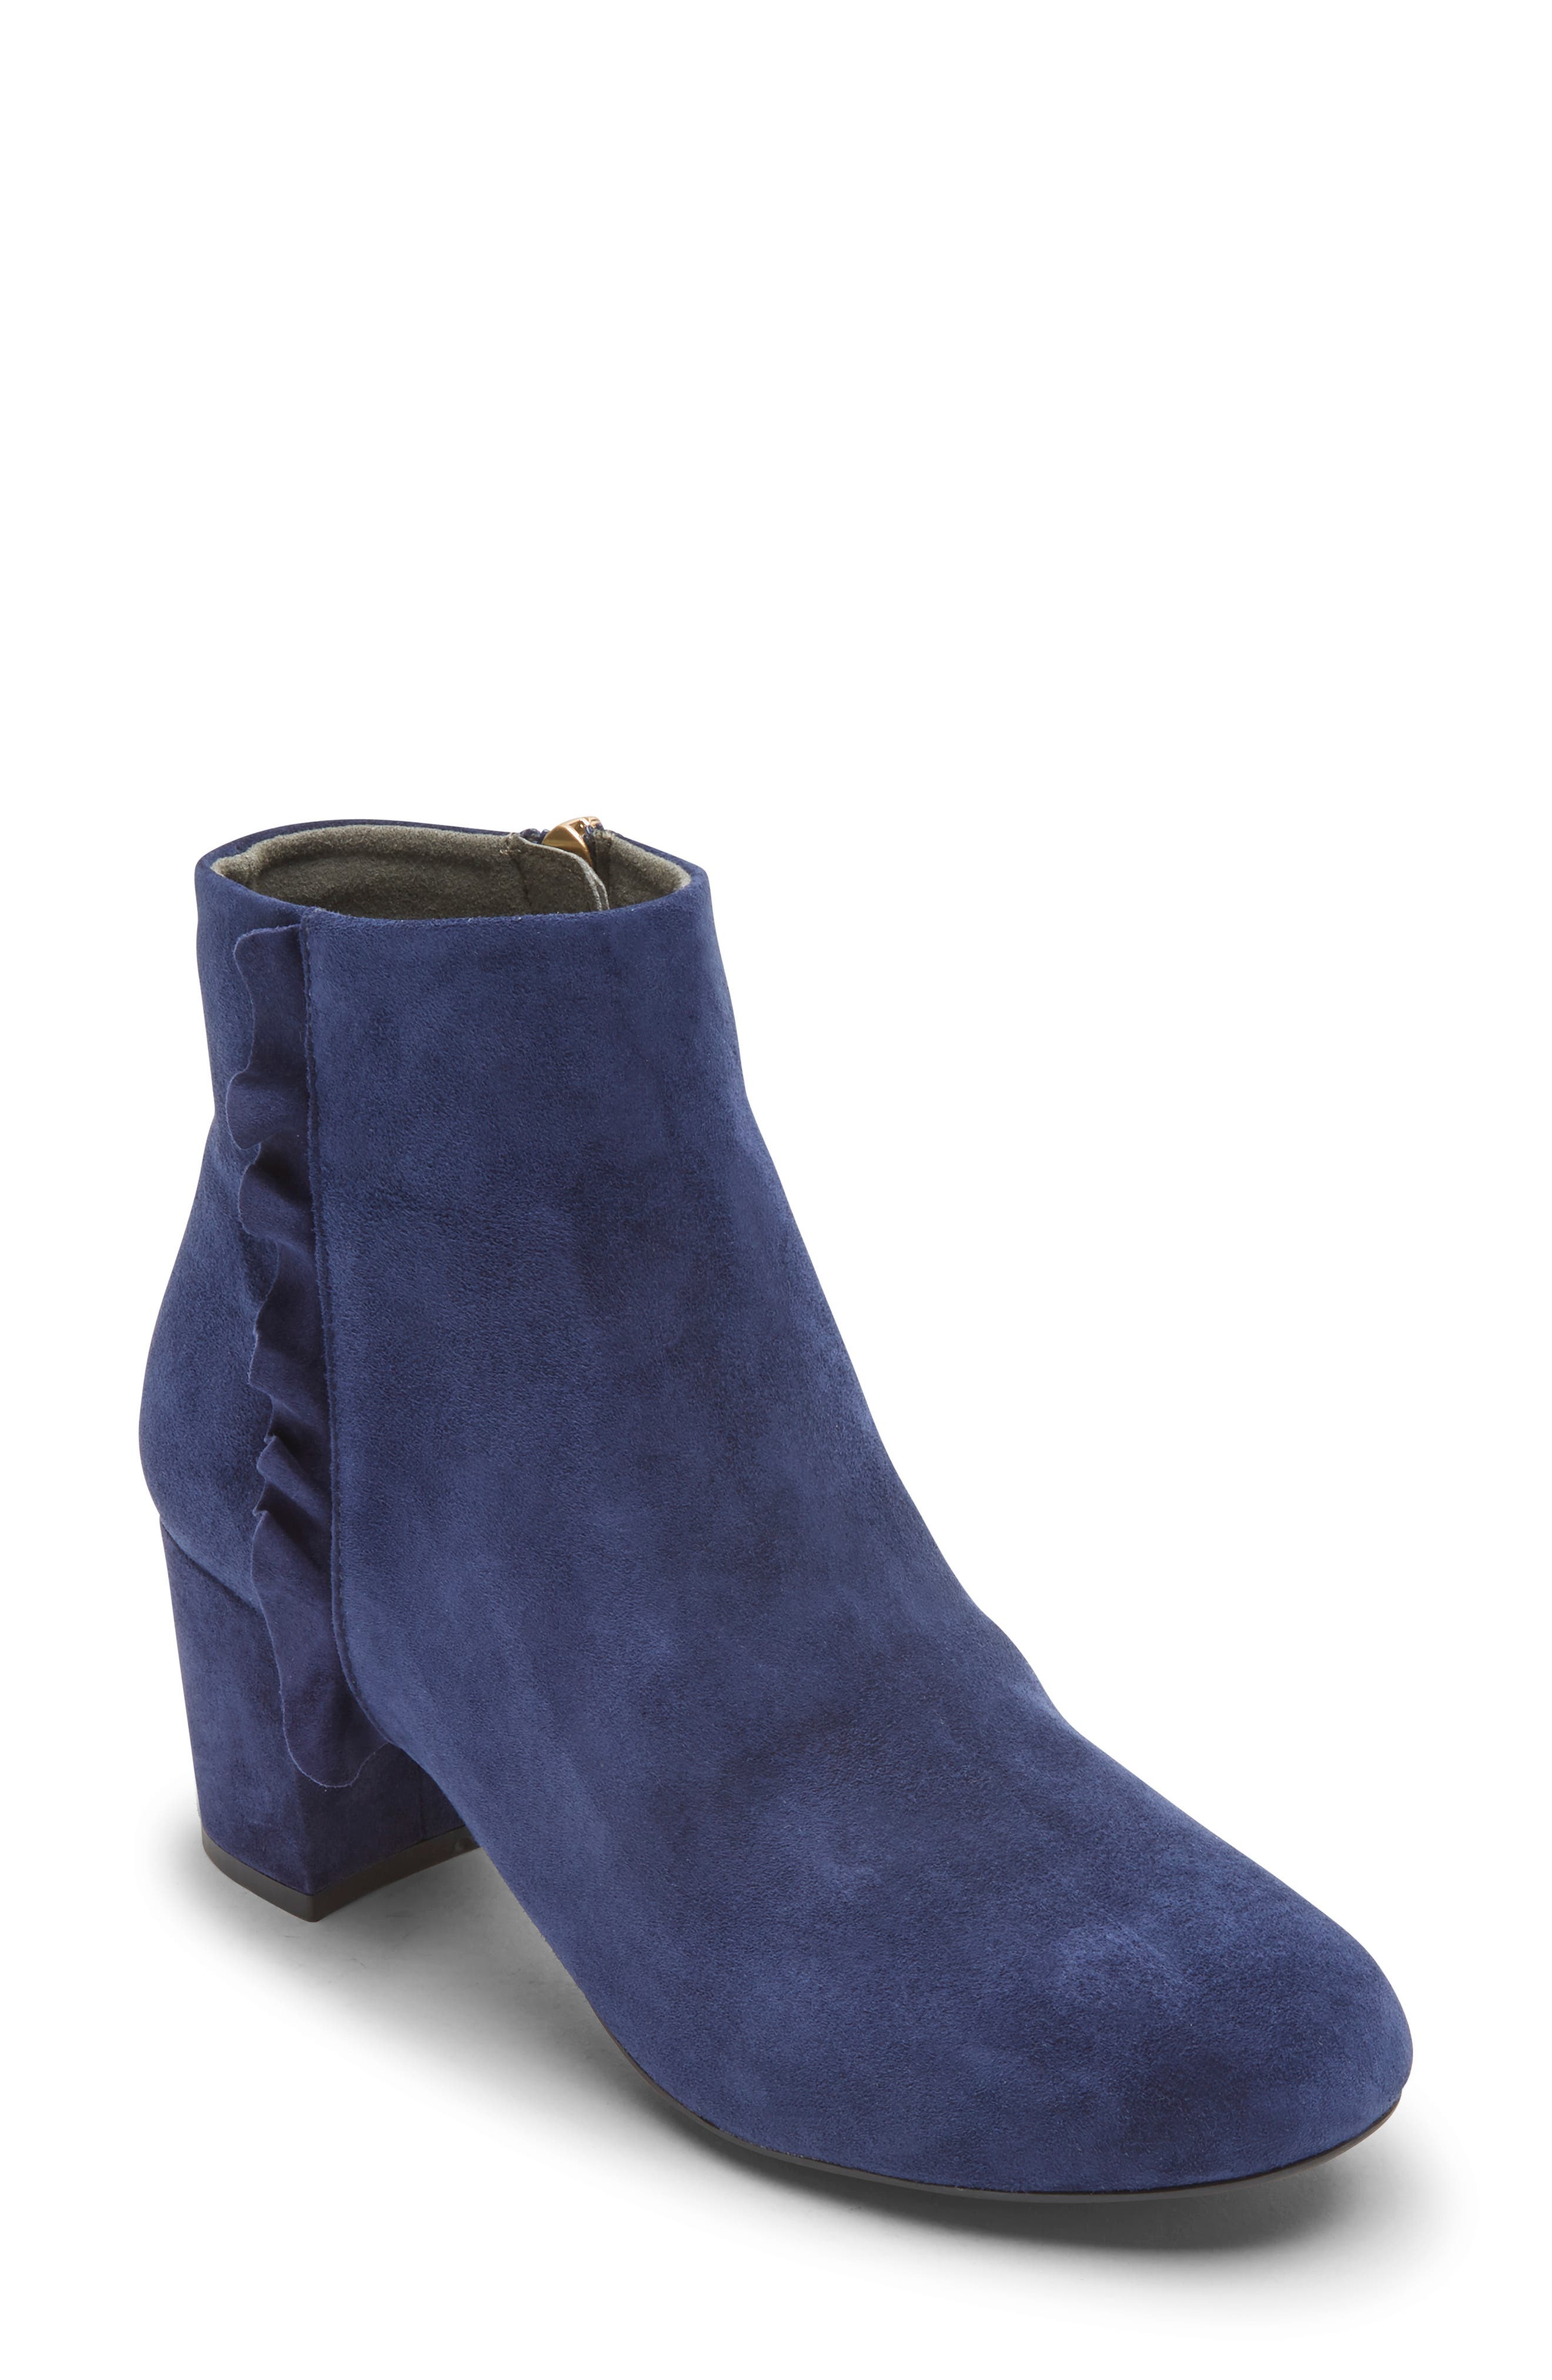 Women's Rockport Shoes Sale \u0026 Clearance